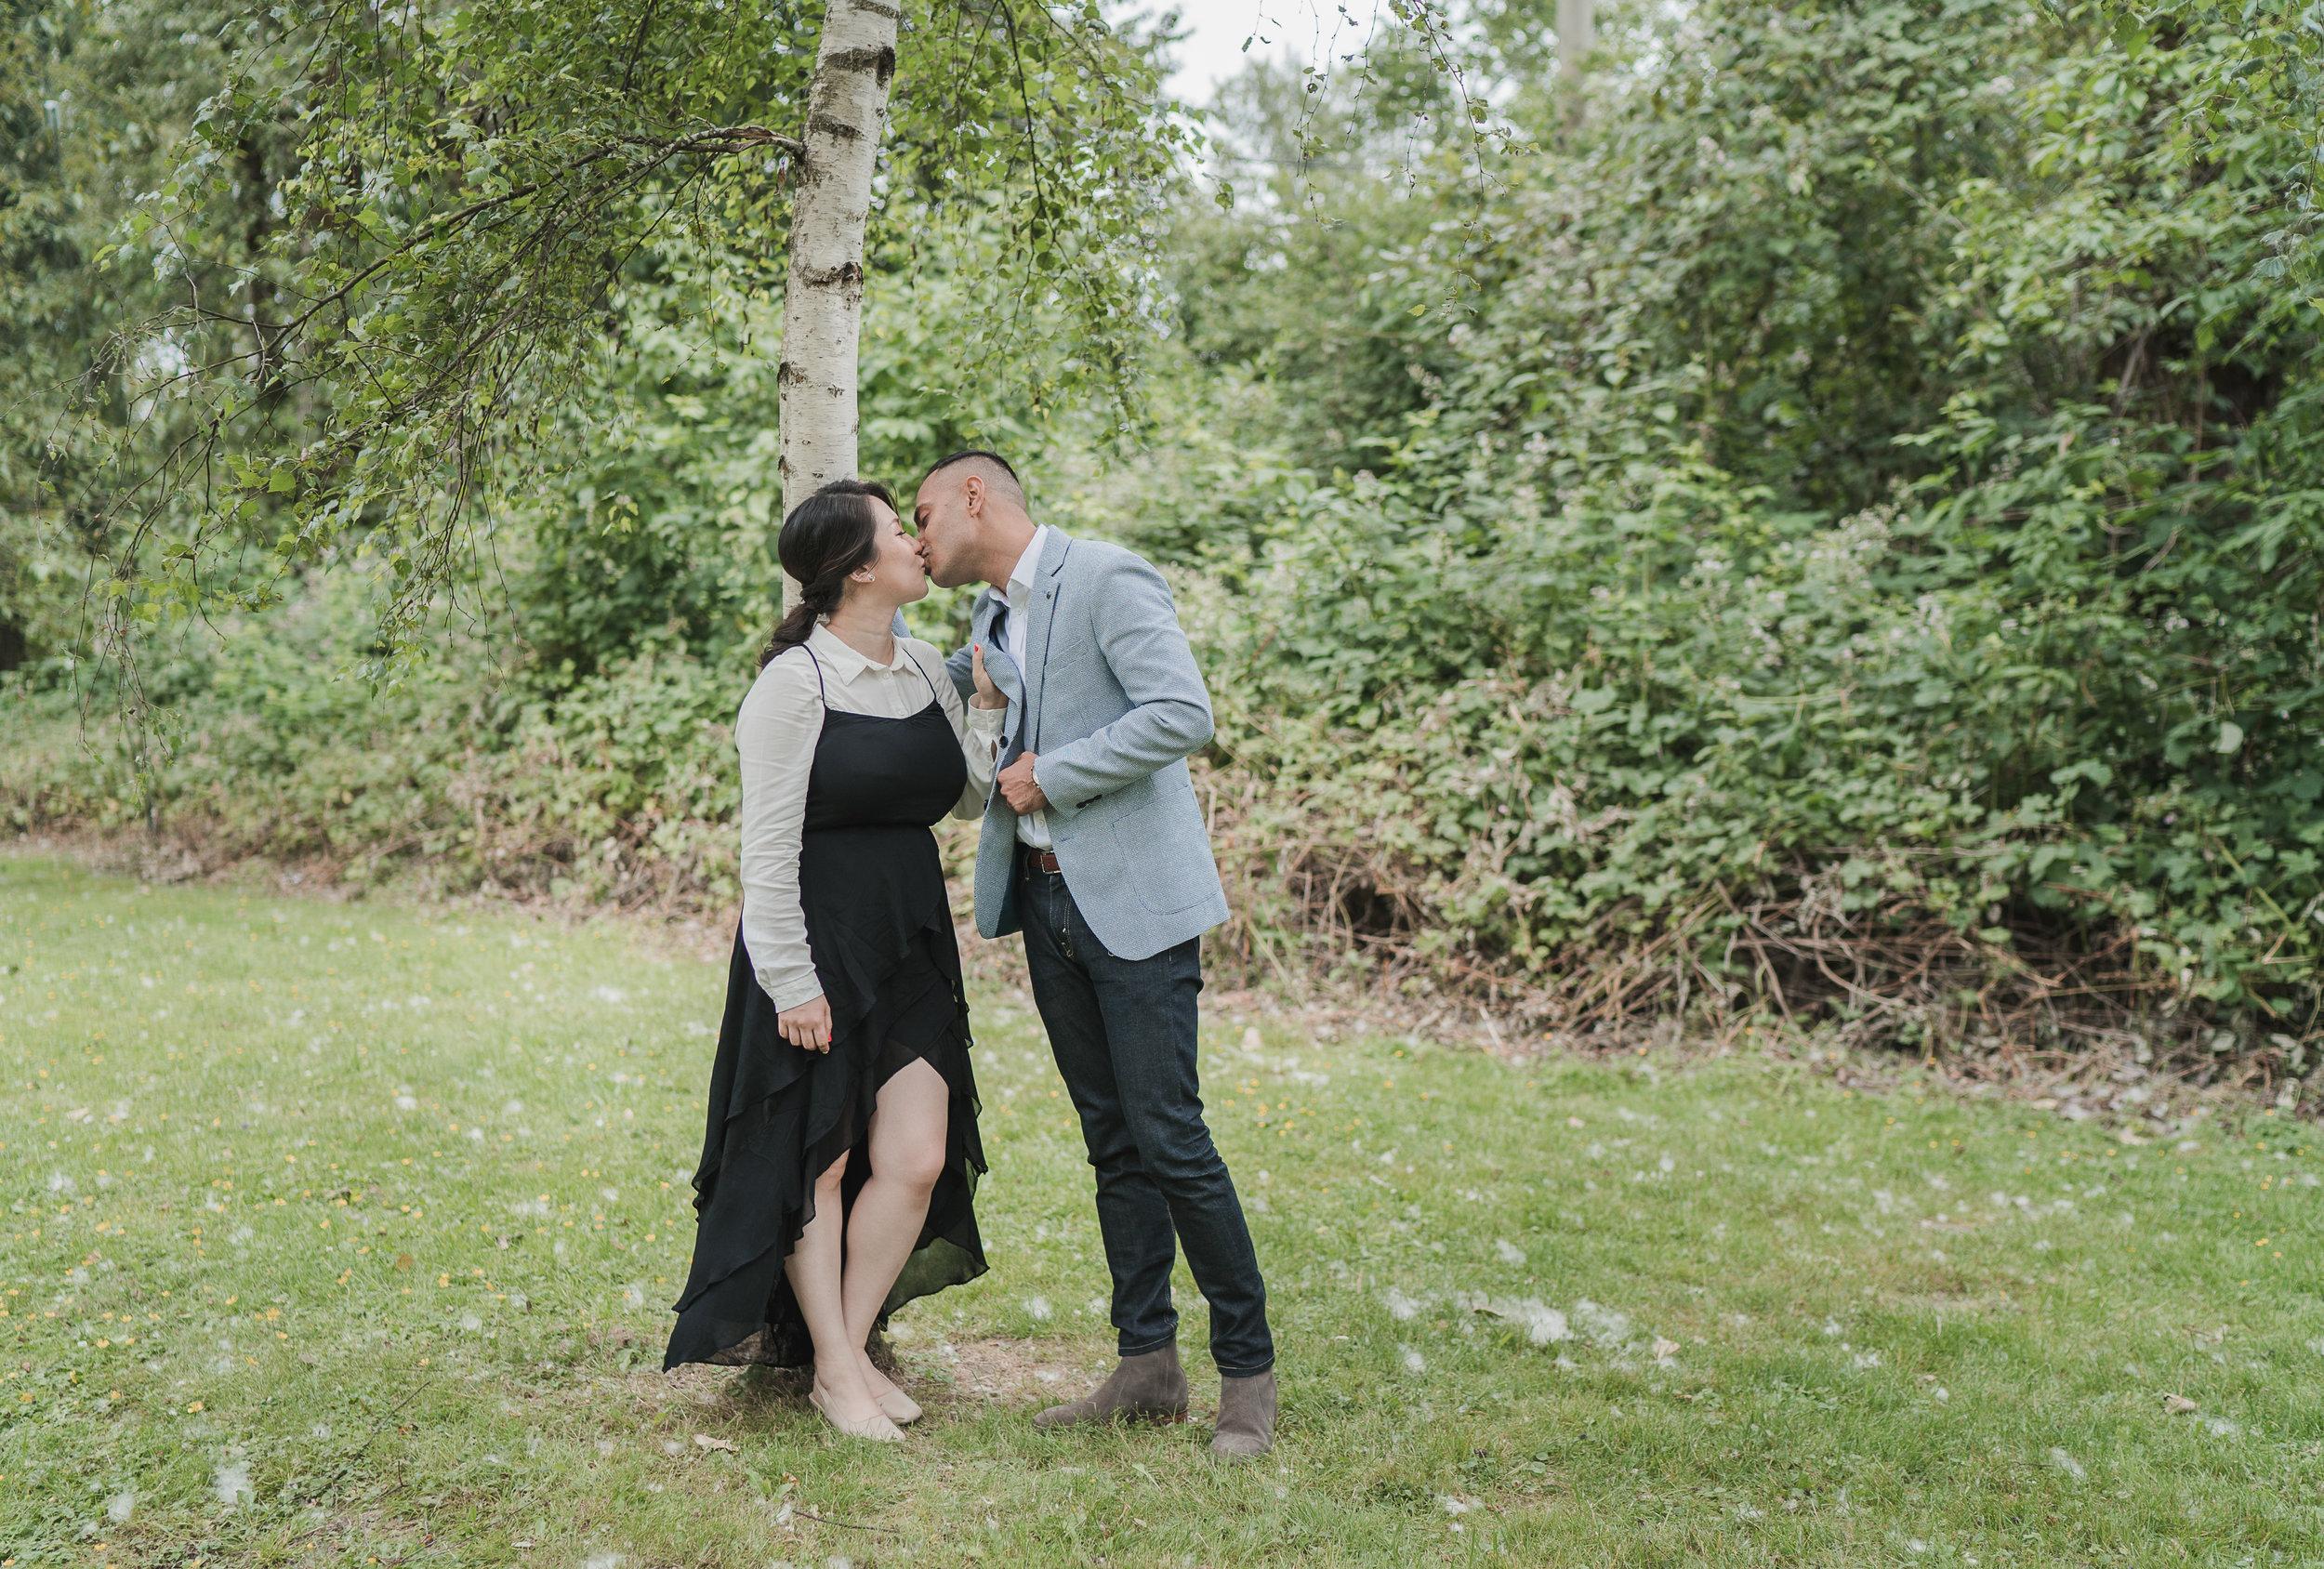 20190622 - Monika & Johnson Engagement- 0053.jpg